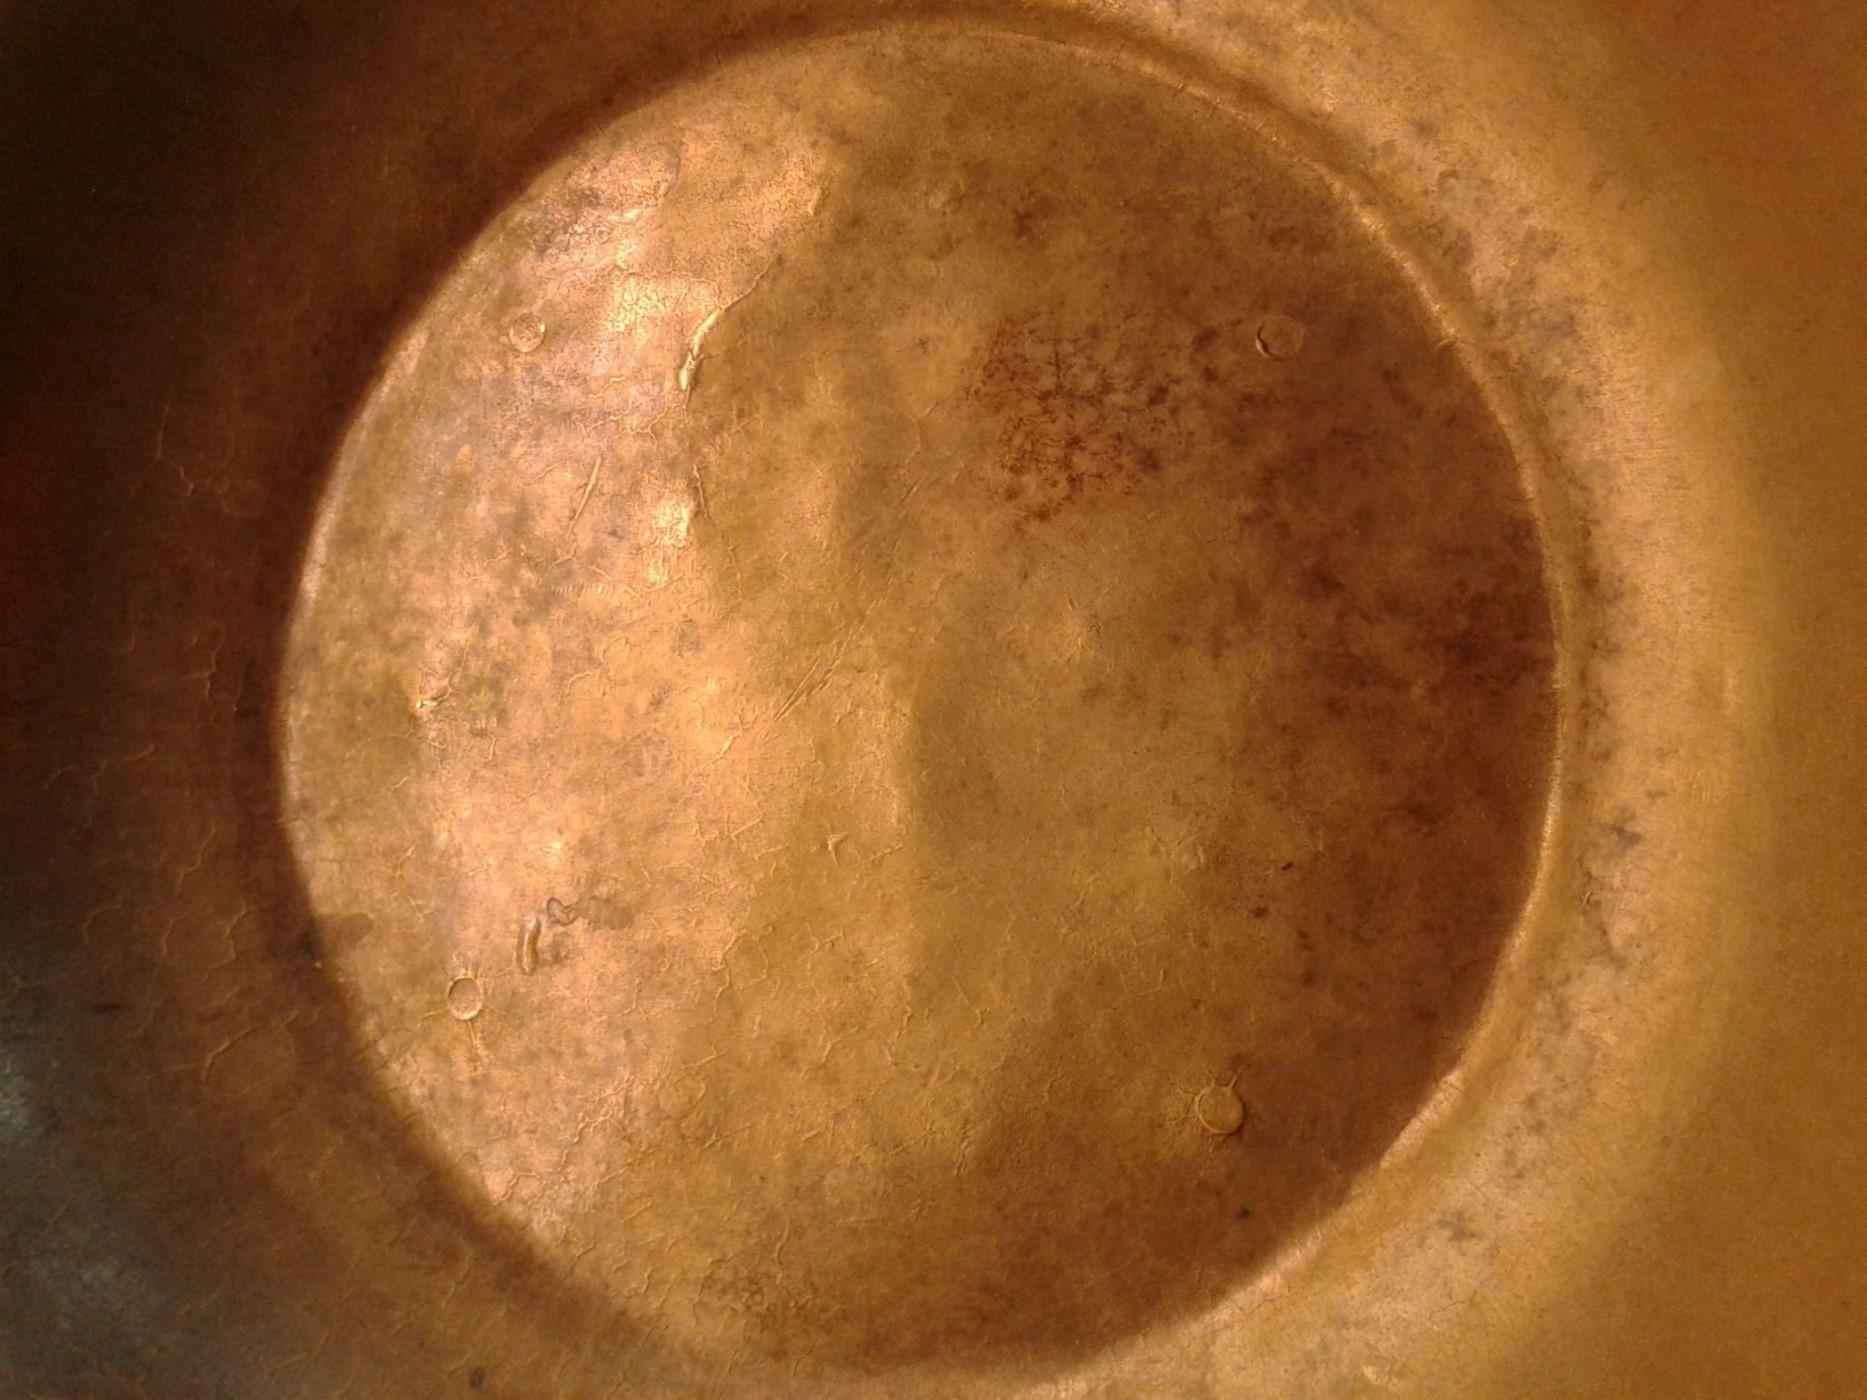 Kooktips – Koper en brons poetsen met ketchup